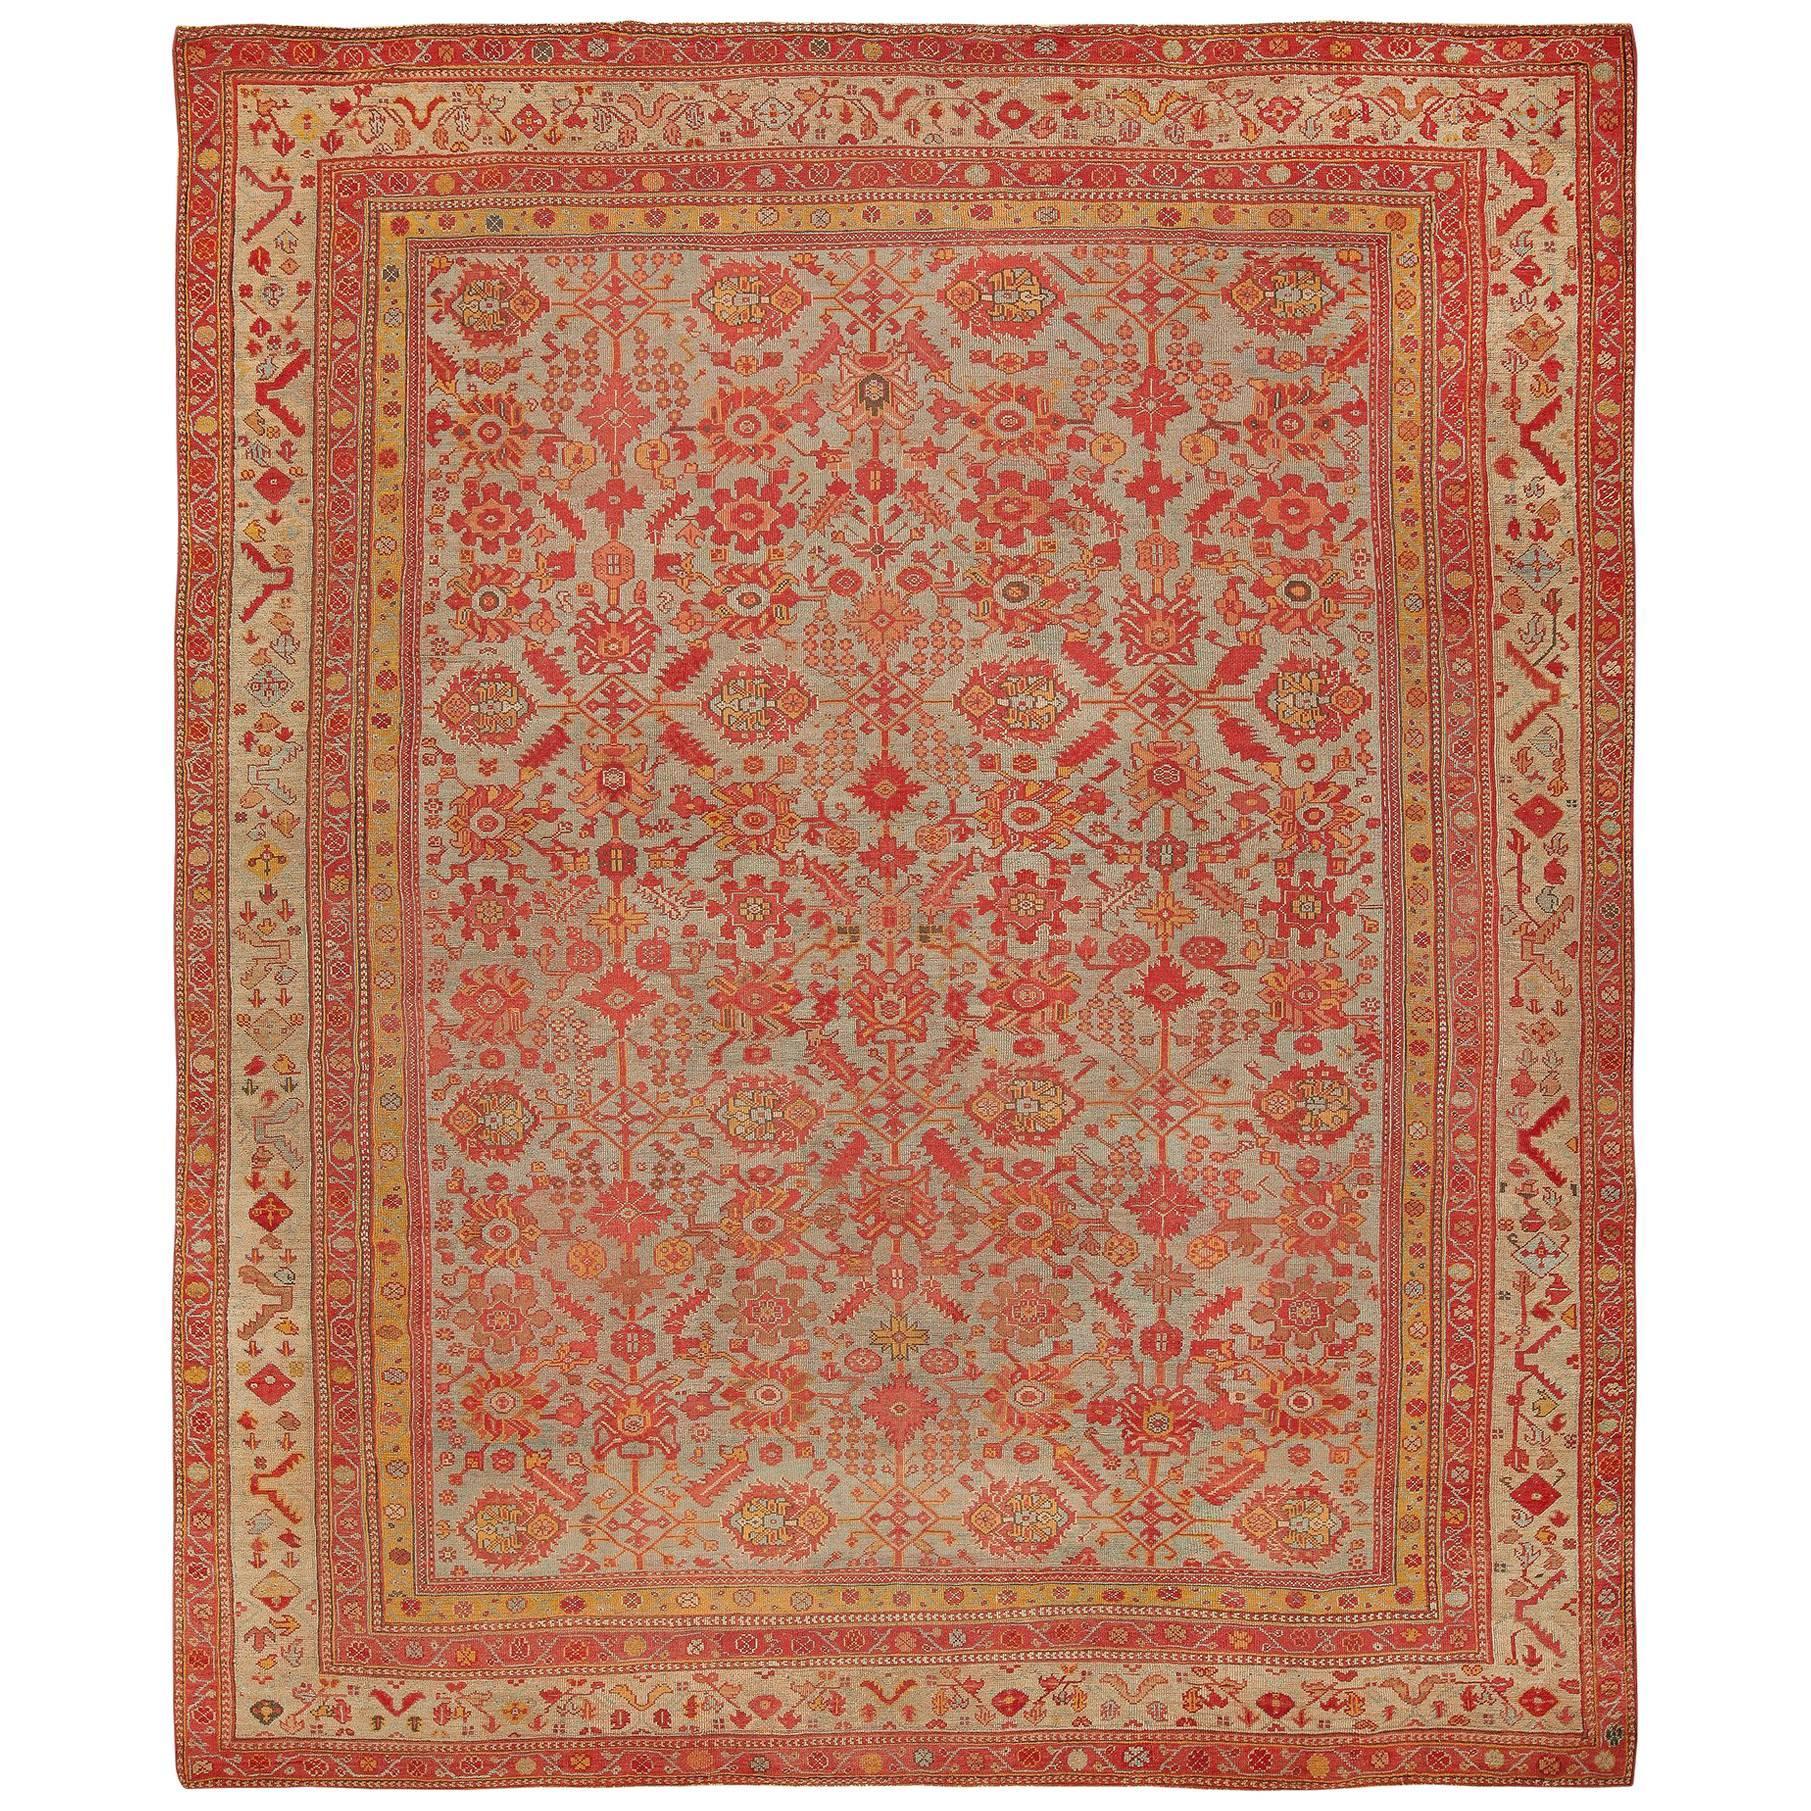 Room Size Antique Decorative Turkish Oushak Rug. Size: 11 ft 8 in x 14 ft